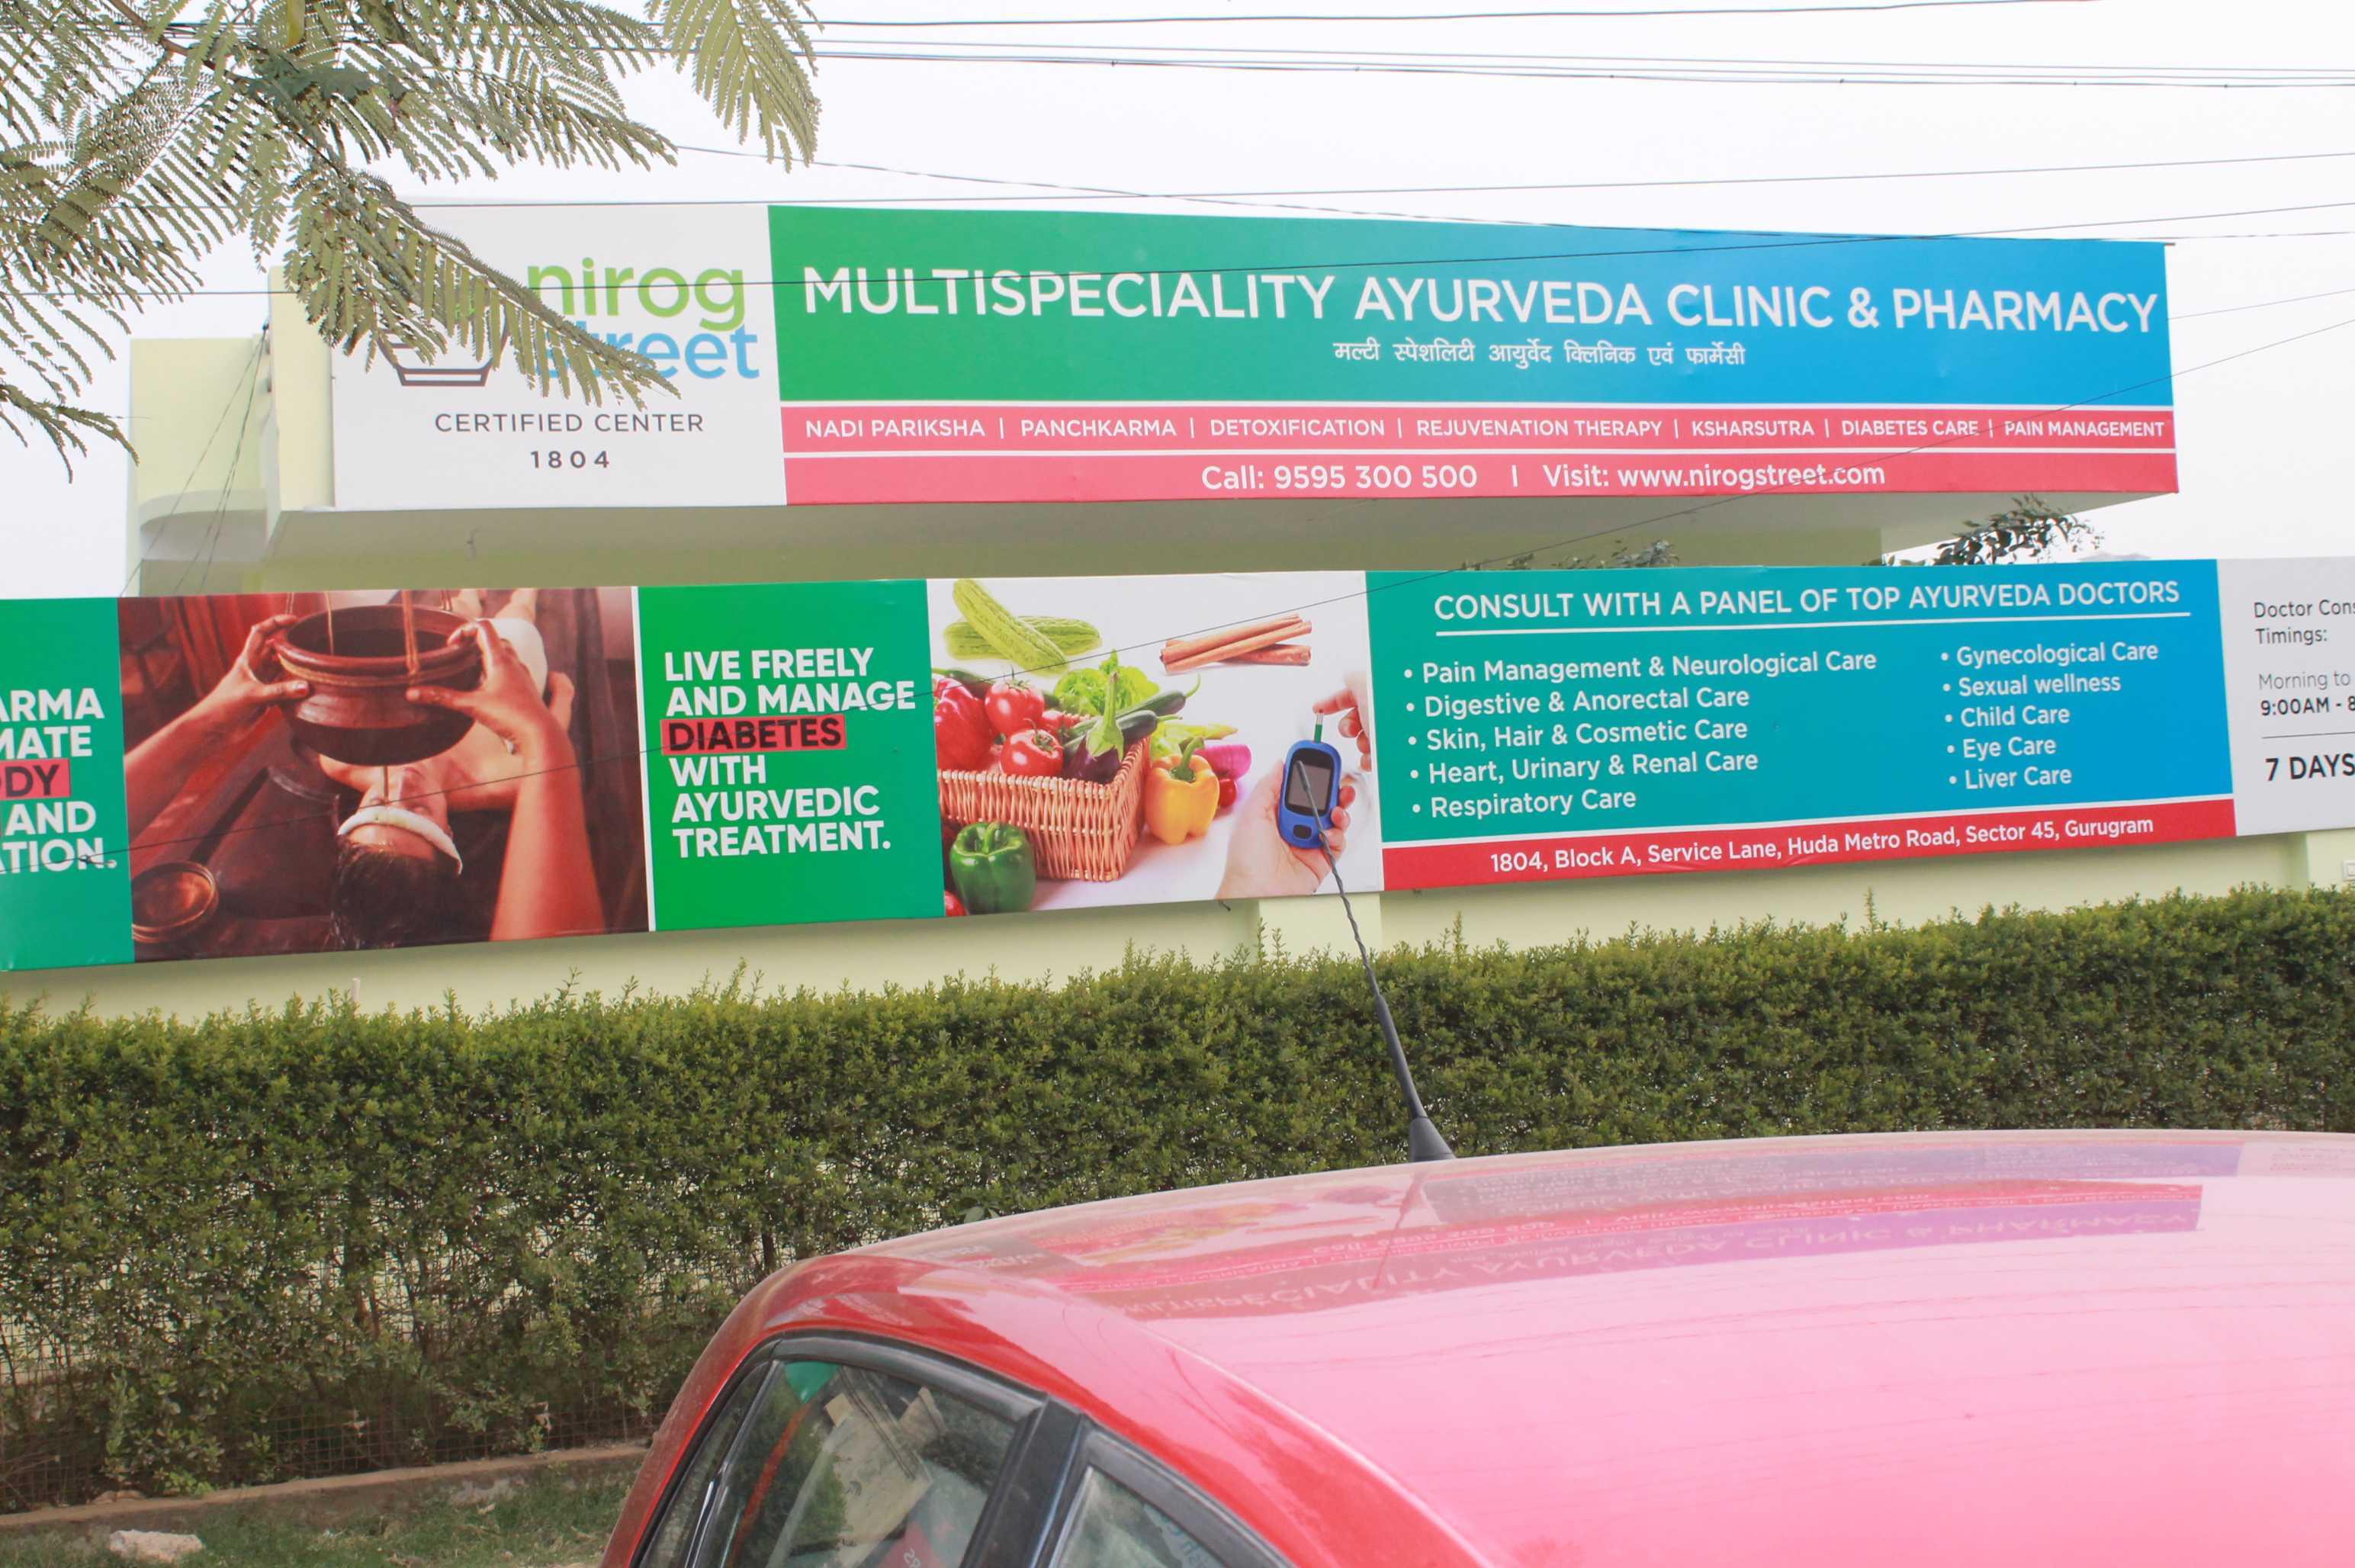 Gurugram's First Multispeciality Ayurveda Clinic